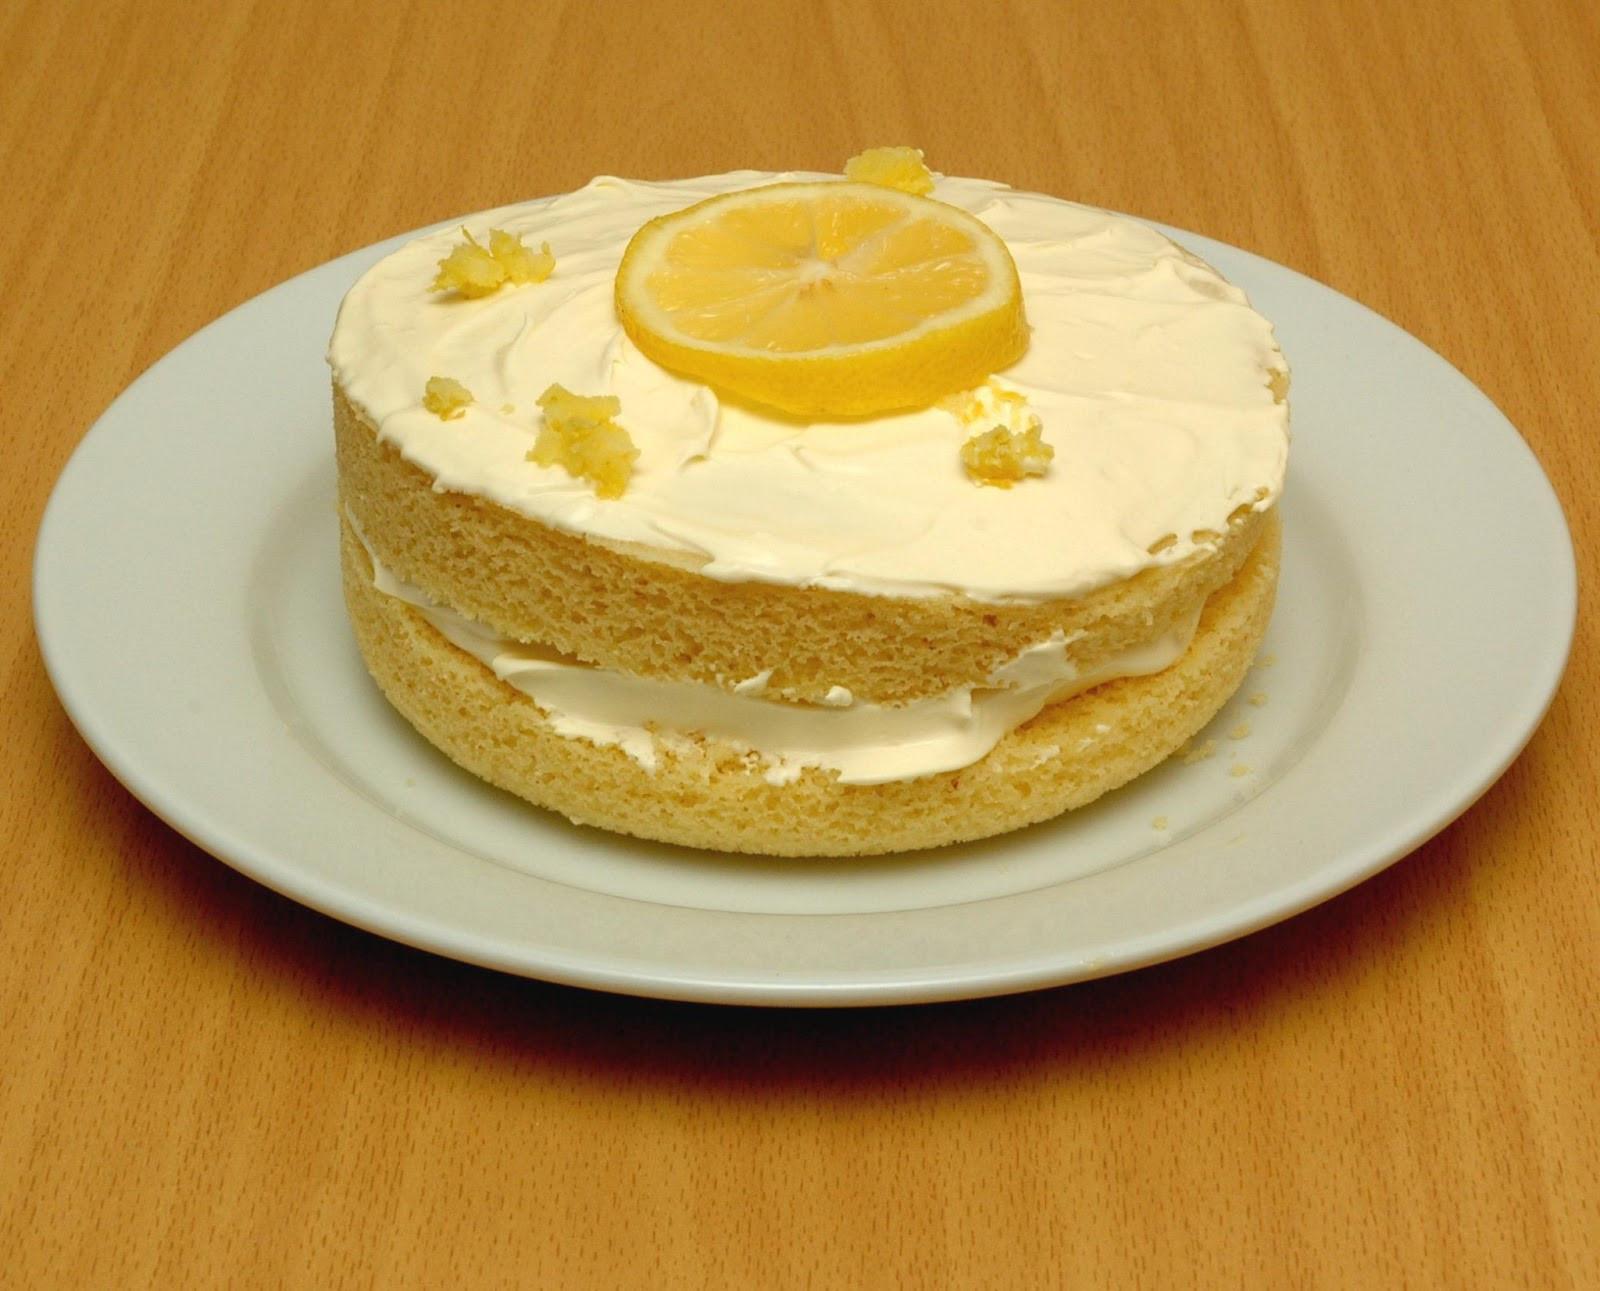 Lemon Sponge Cake  The Low Carb Diabetic Lowcarb lemon sponge cake